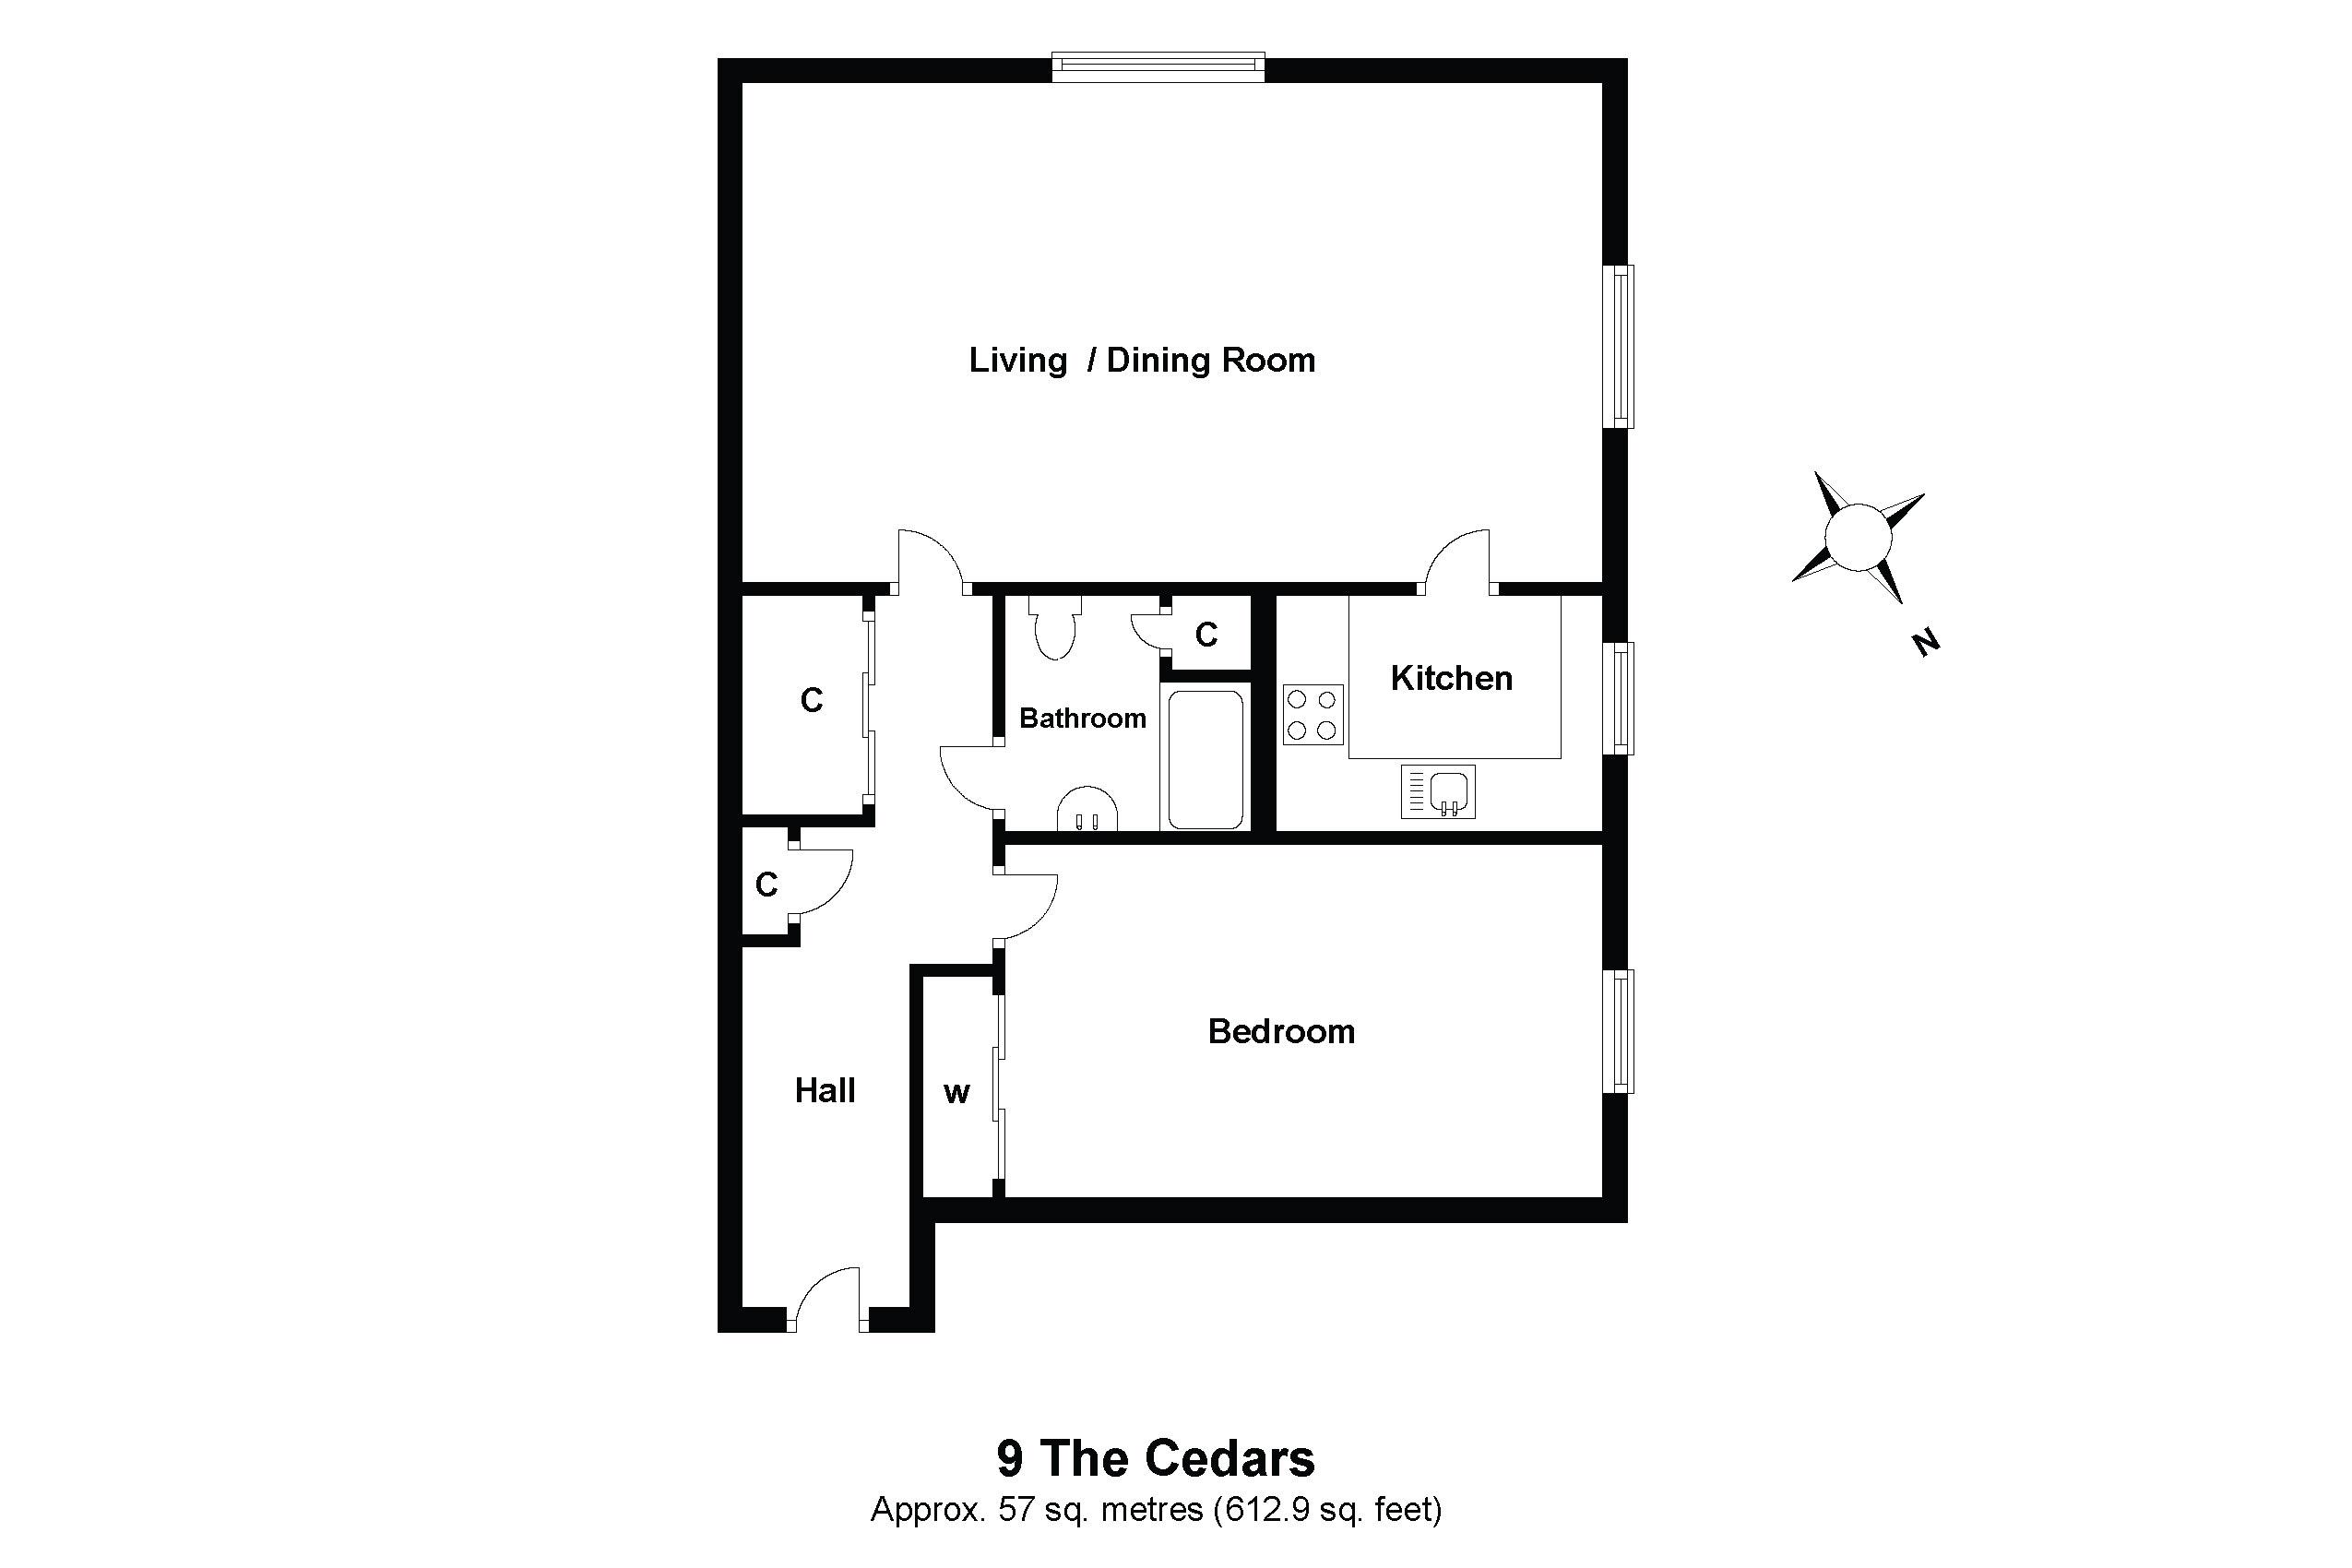 09 The Cedars Floorplan